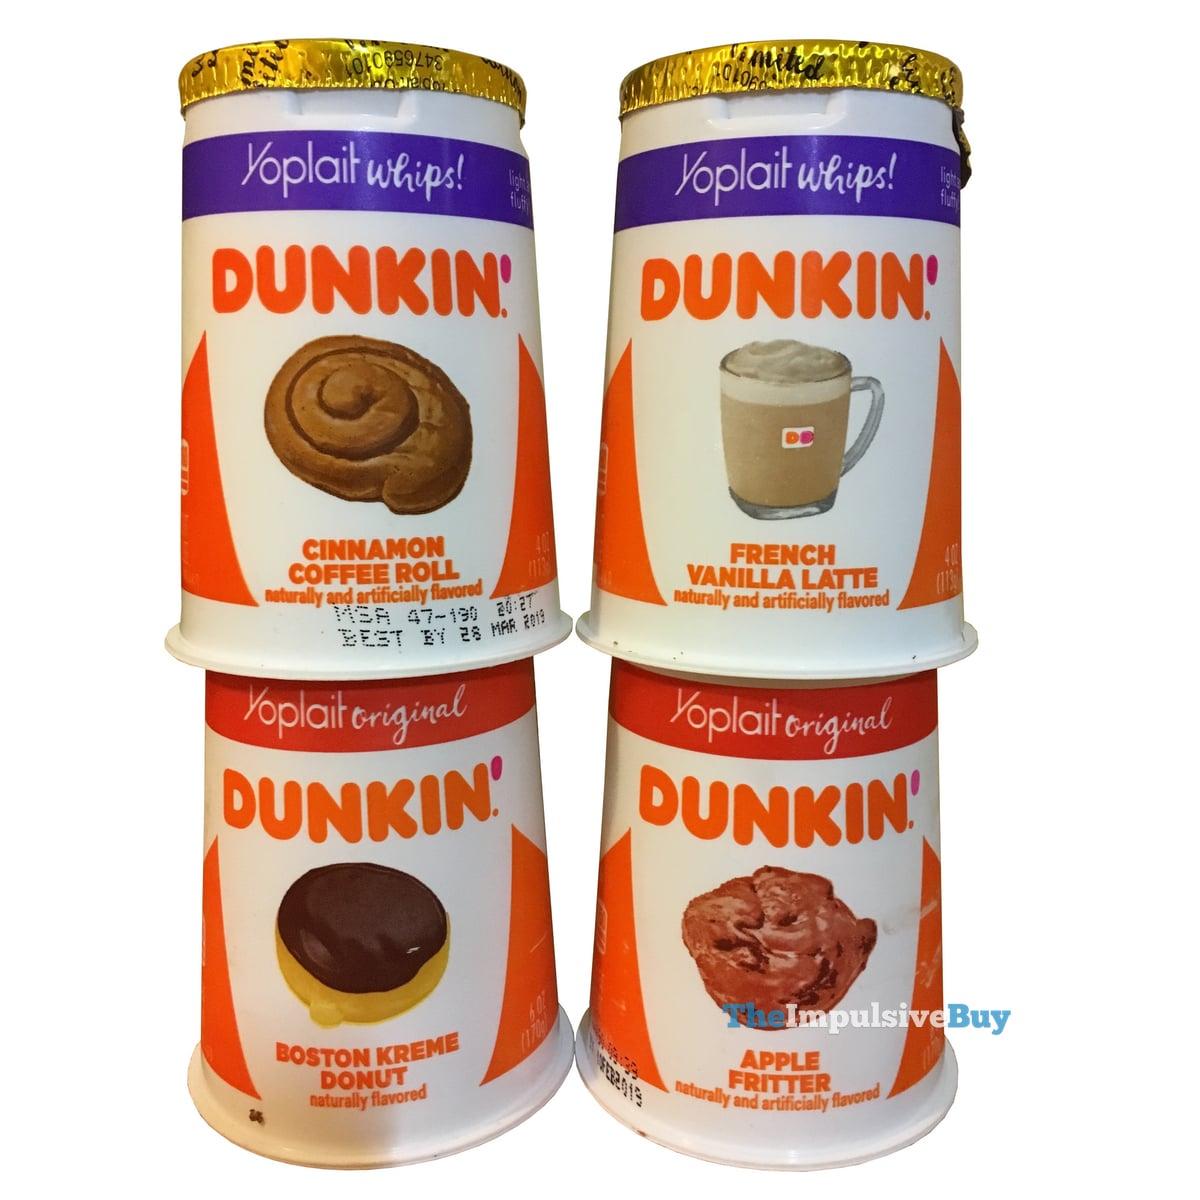 REVIEW: Yoplait Dunkin' Inspired Yogurt Flavors